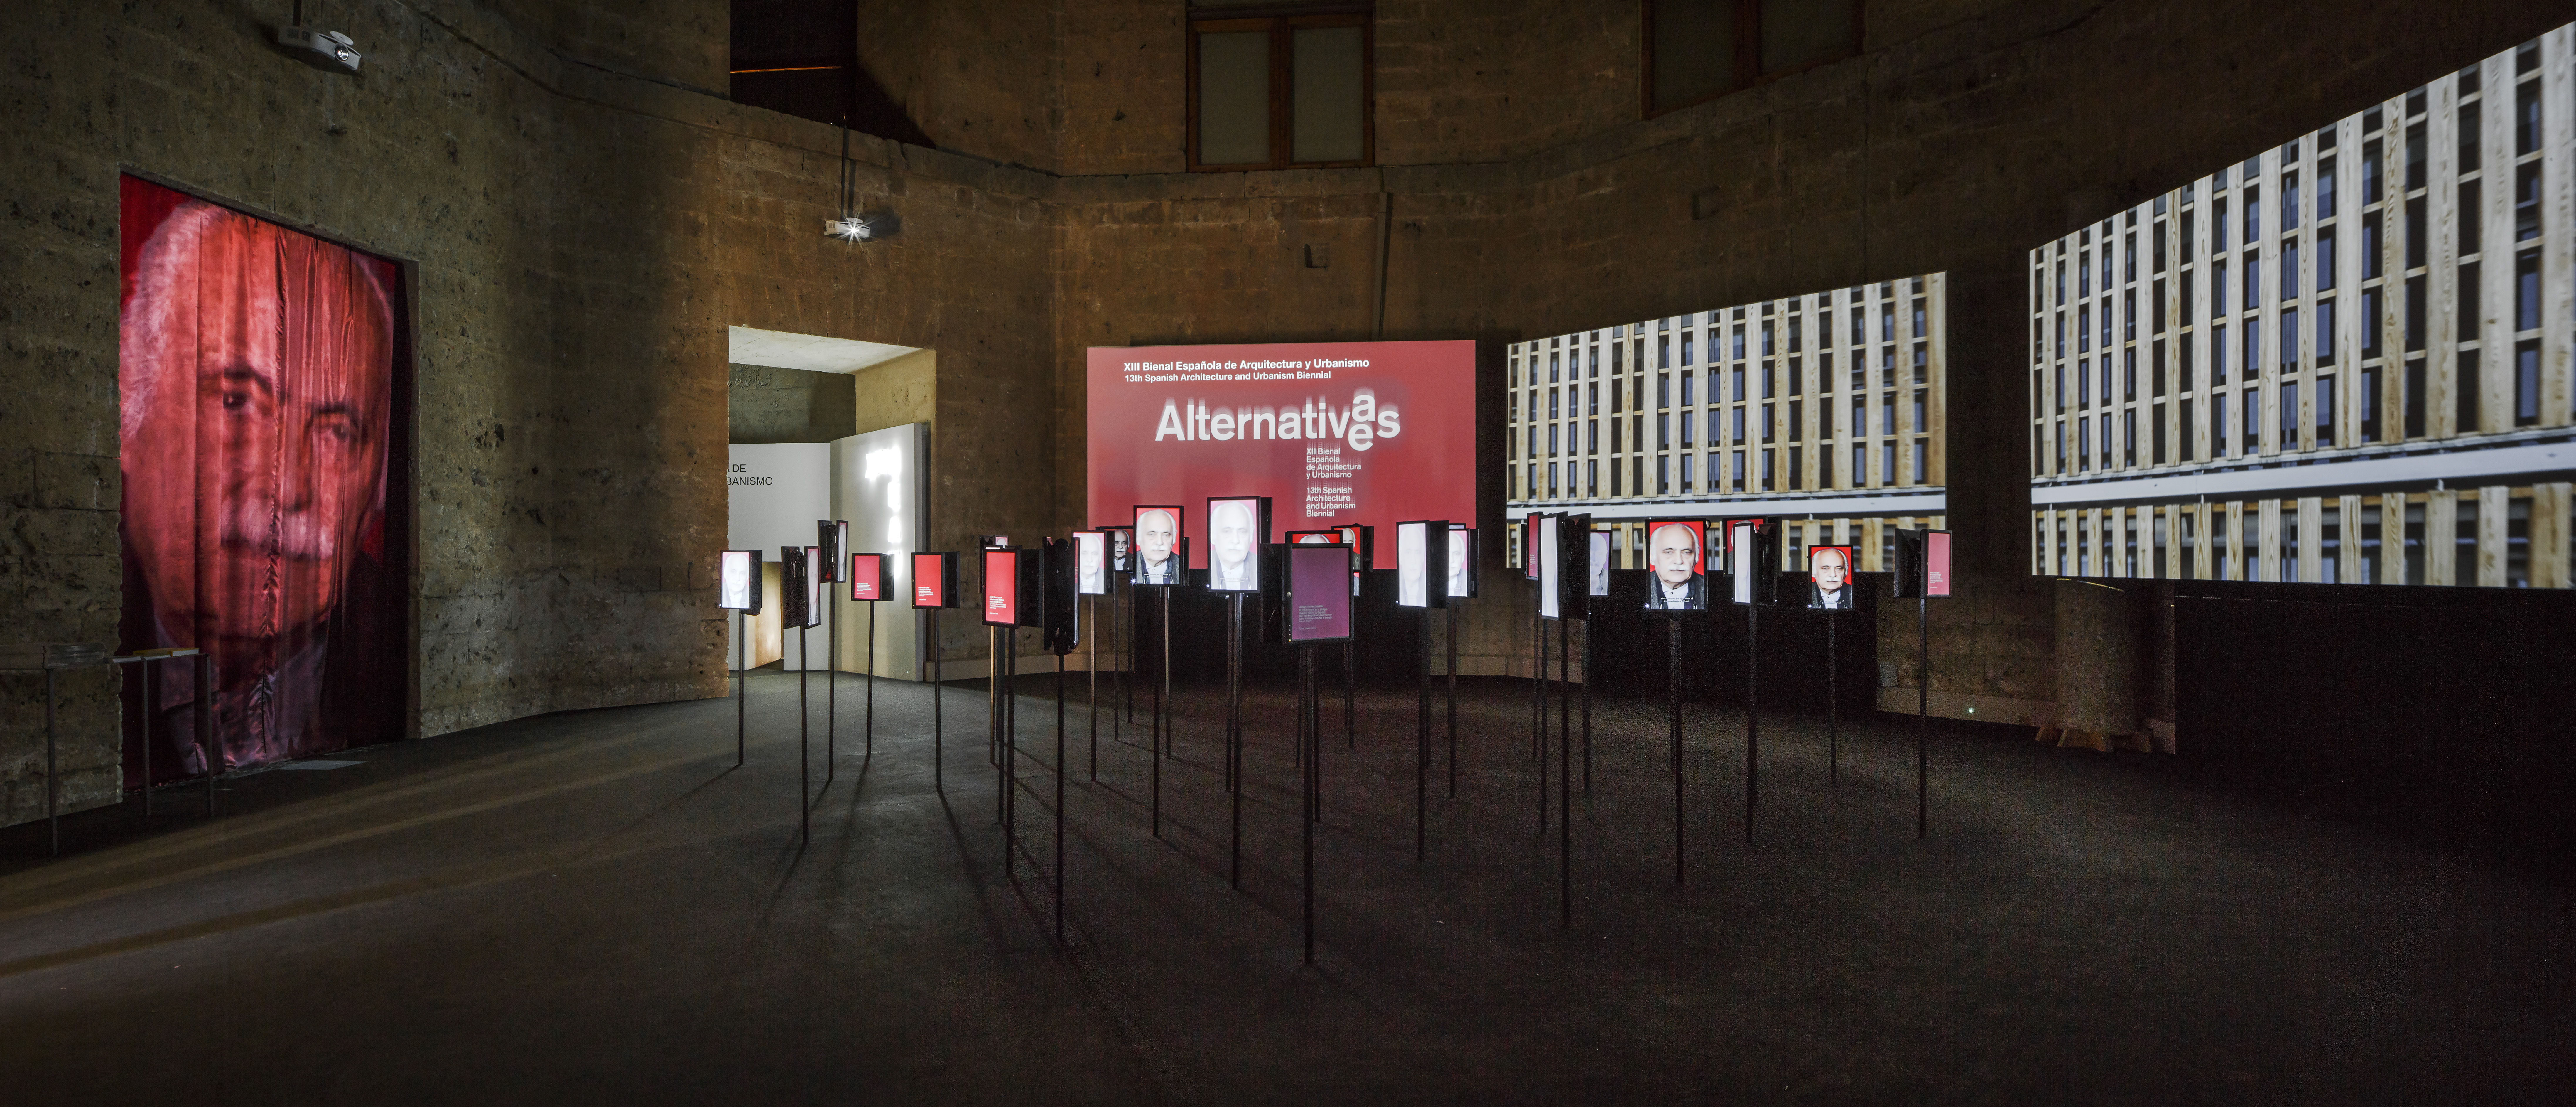 Bienal de Arquitectura - Alhambra